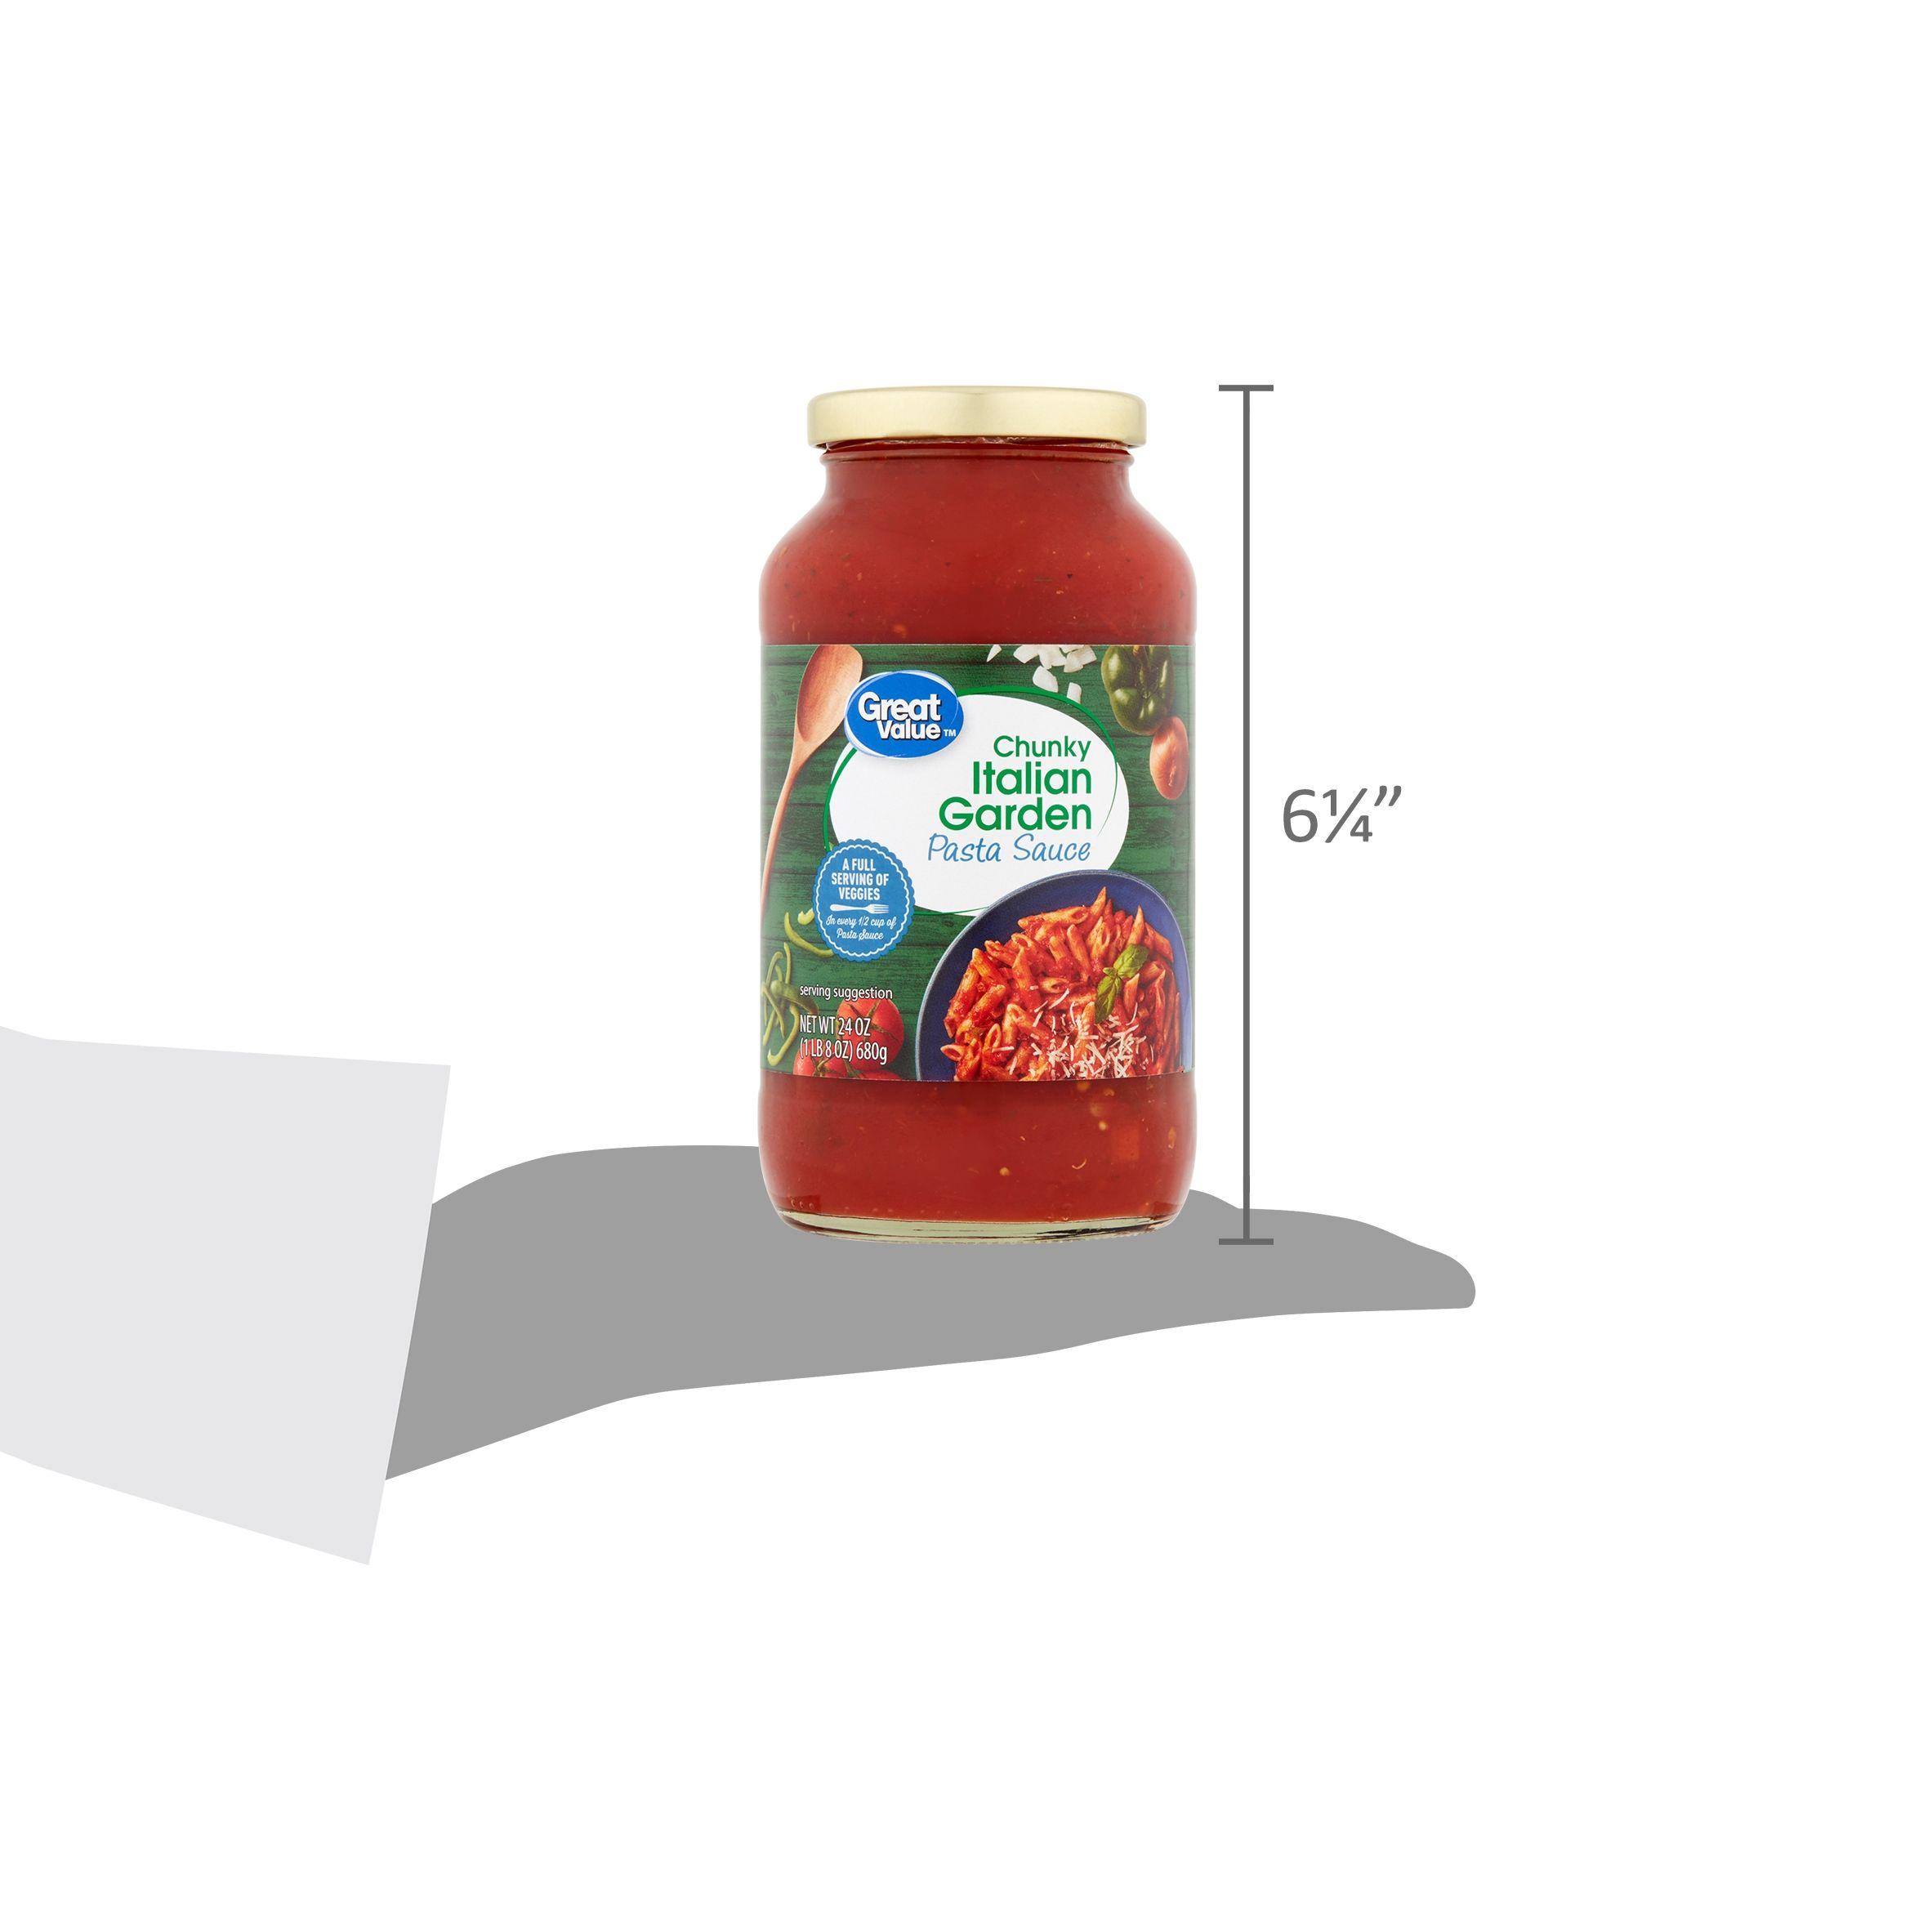 Food Pasta sauce, Delicious vegetables, Gluten free